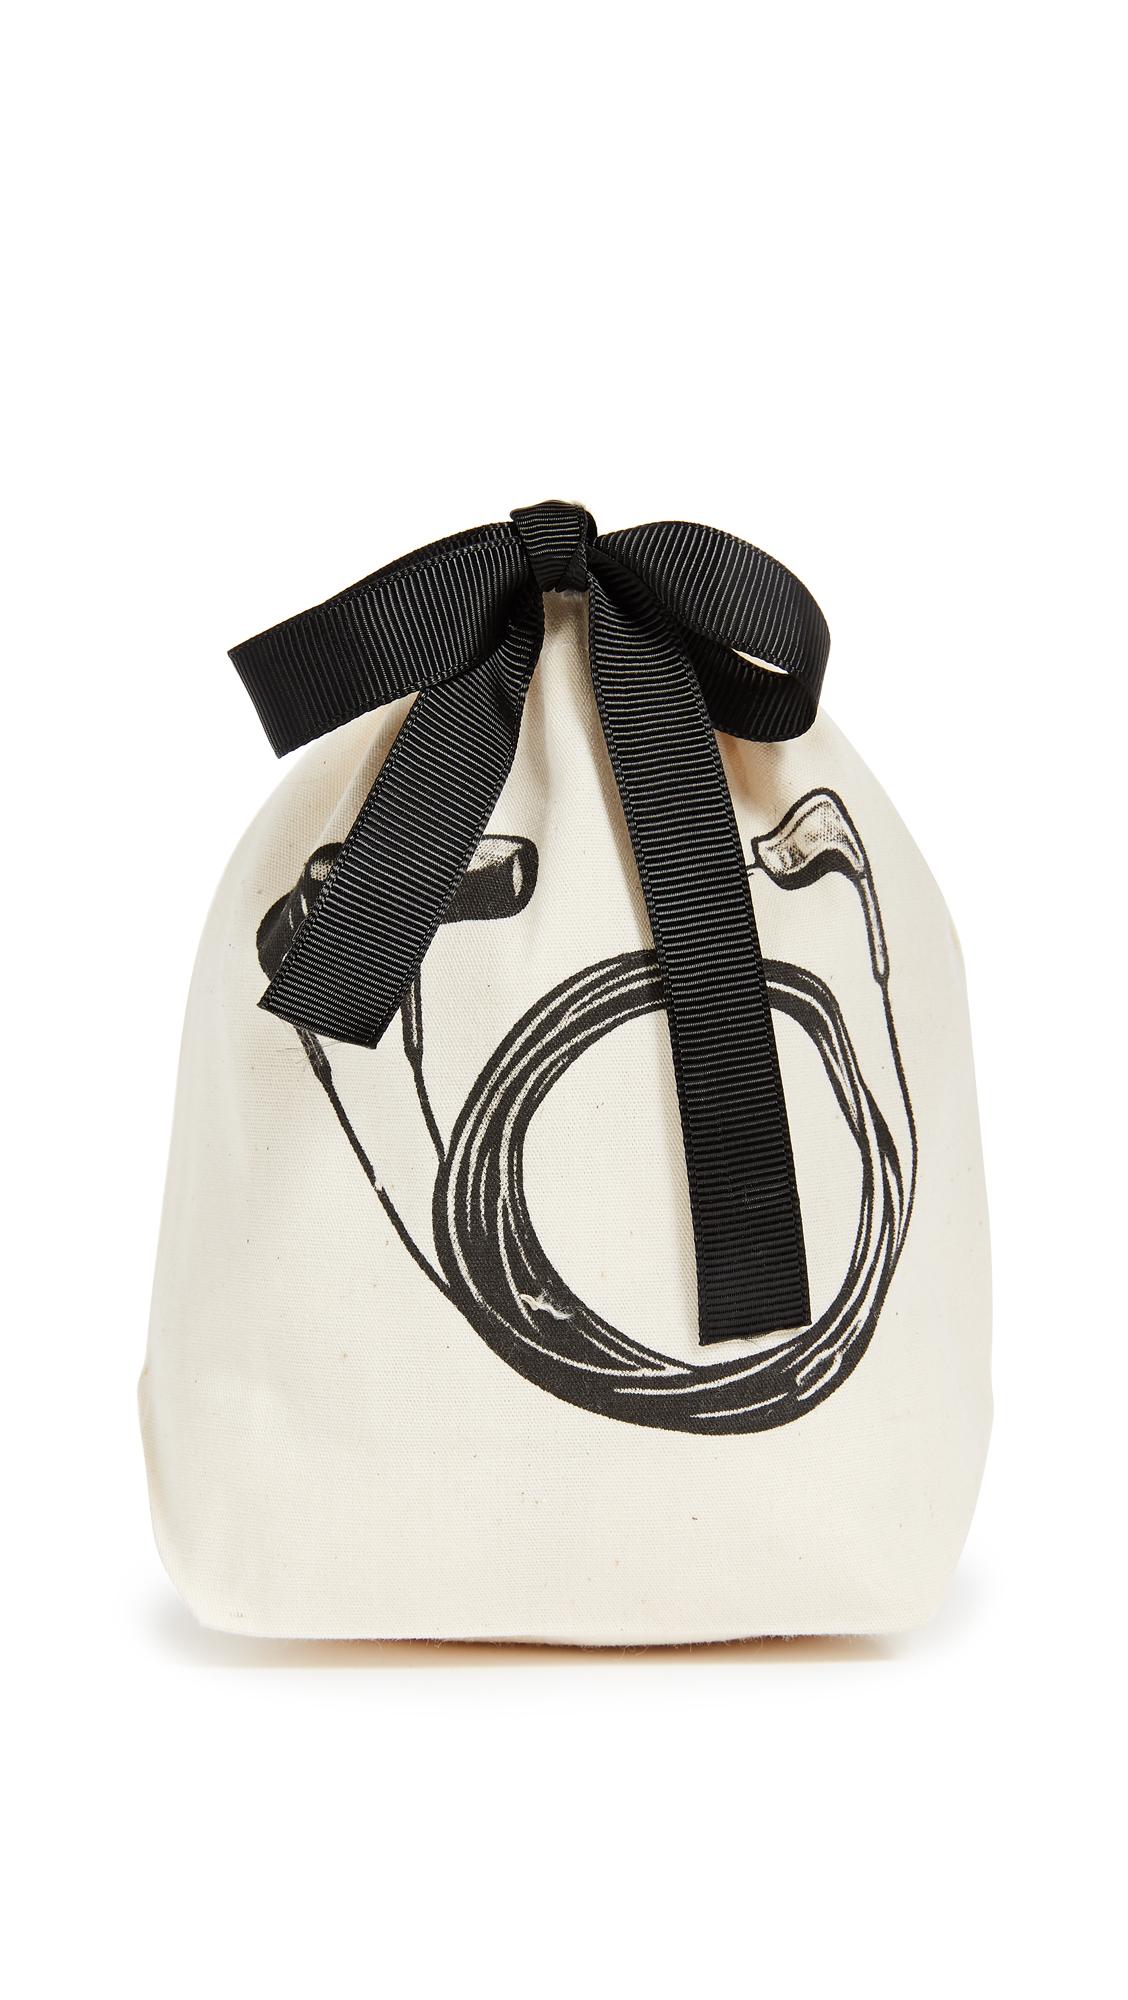 Bag-all Earbud Small Organizing Bag - Natural/Black